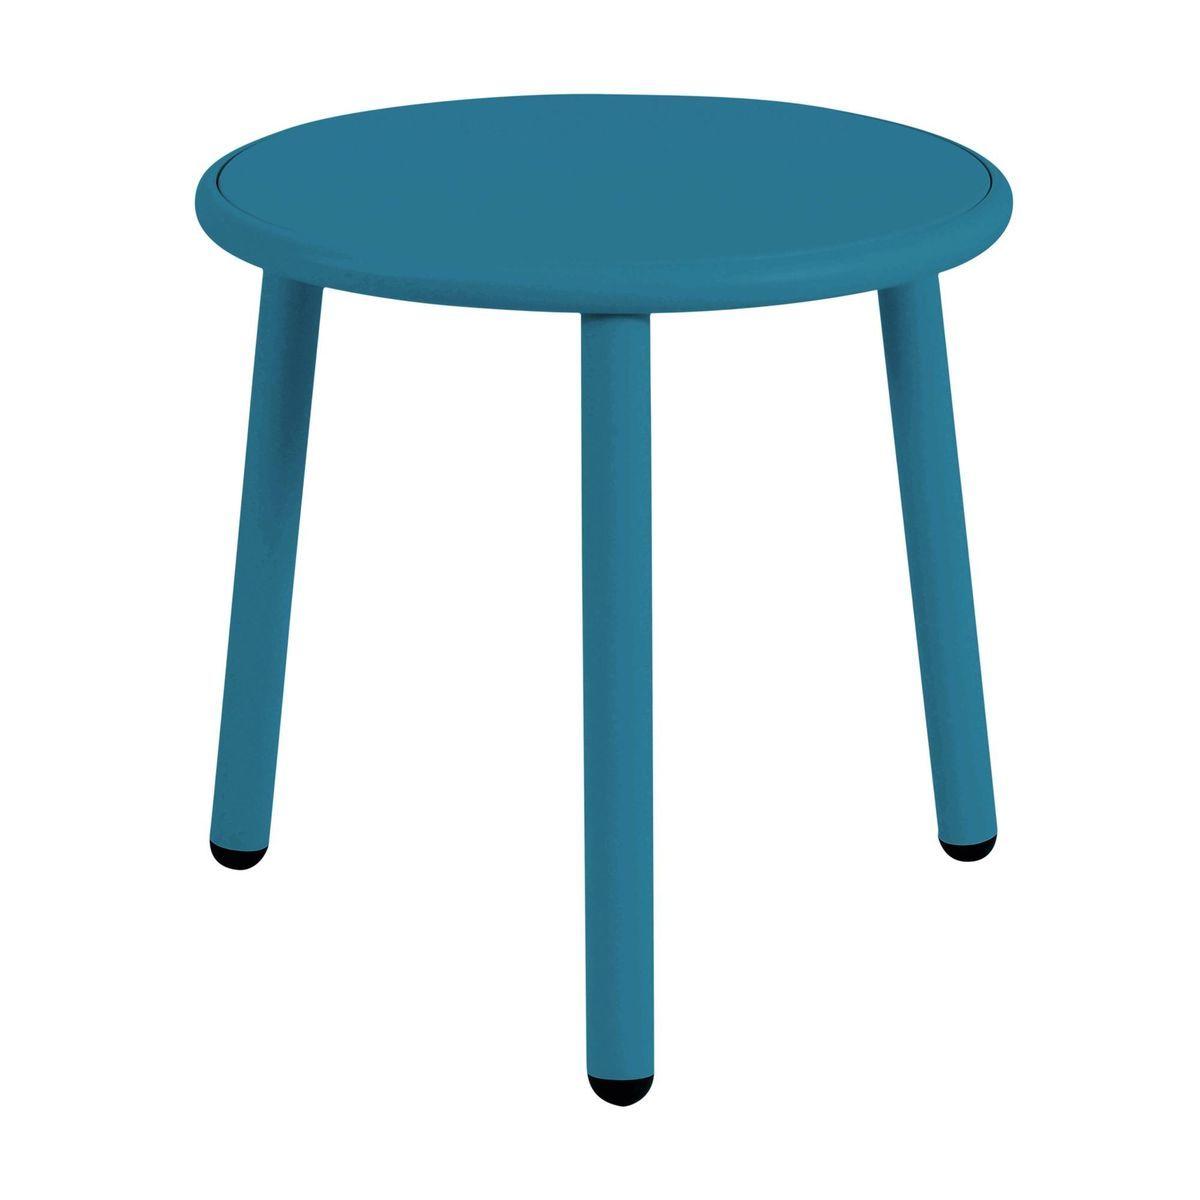 Yard table d 39 appoint de jardin 50cm emu for Table d appoint jardin